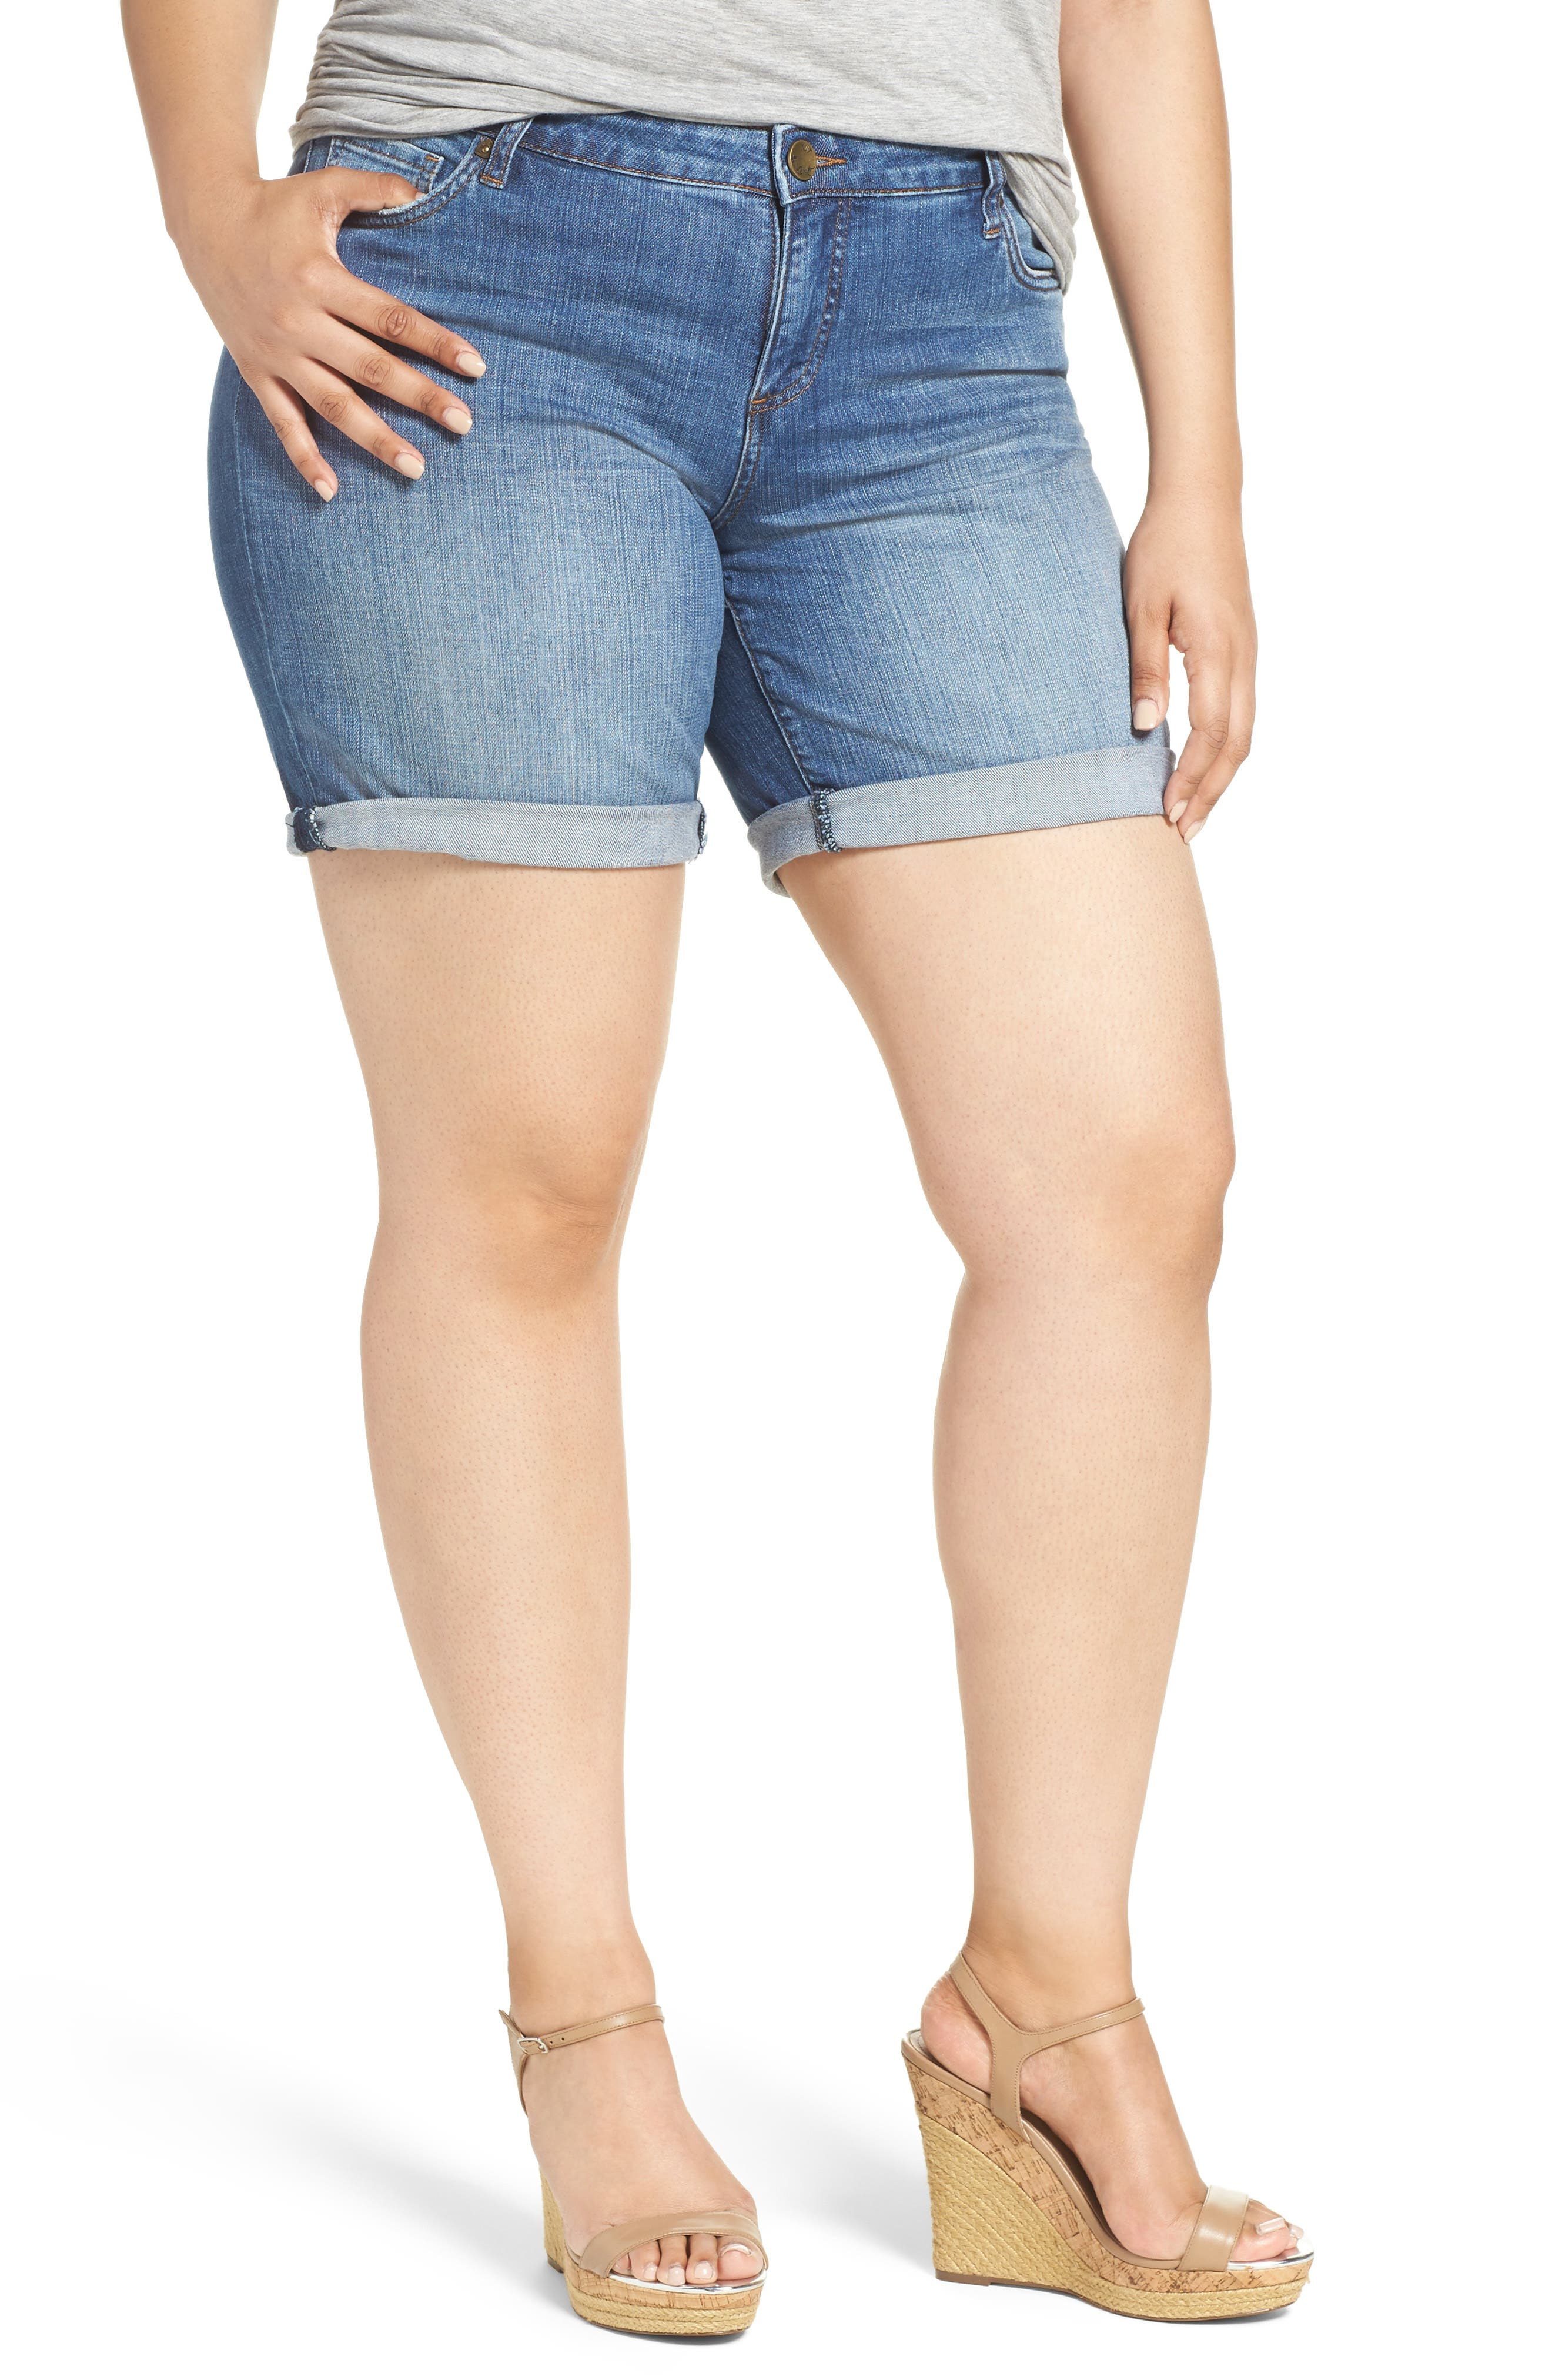 Plus Women's Kut From The Kloth Catherine Denim Boyfriend Shorts